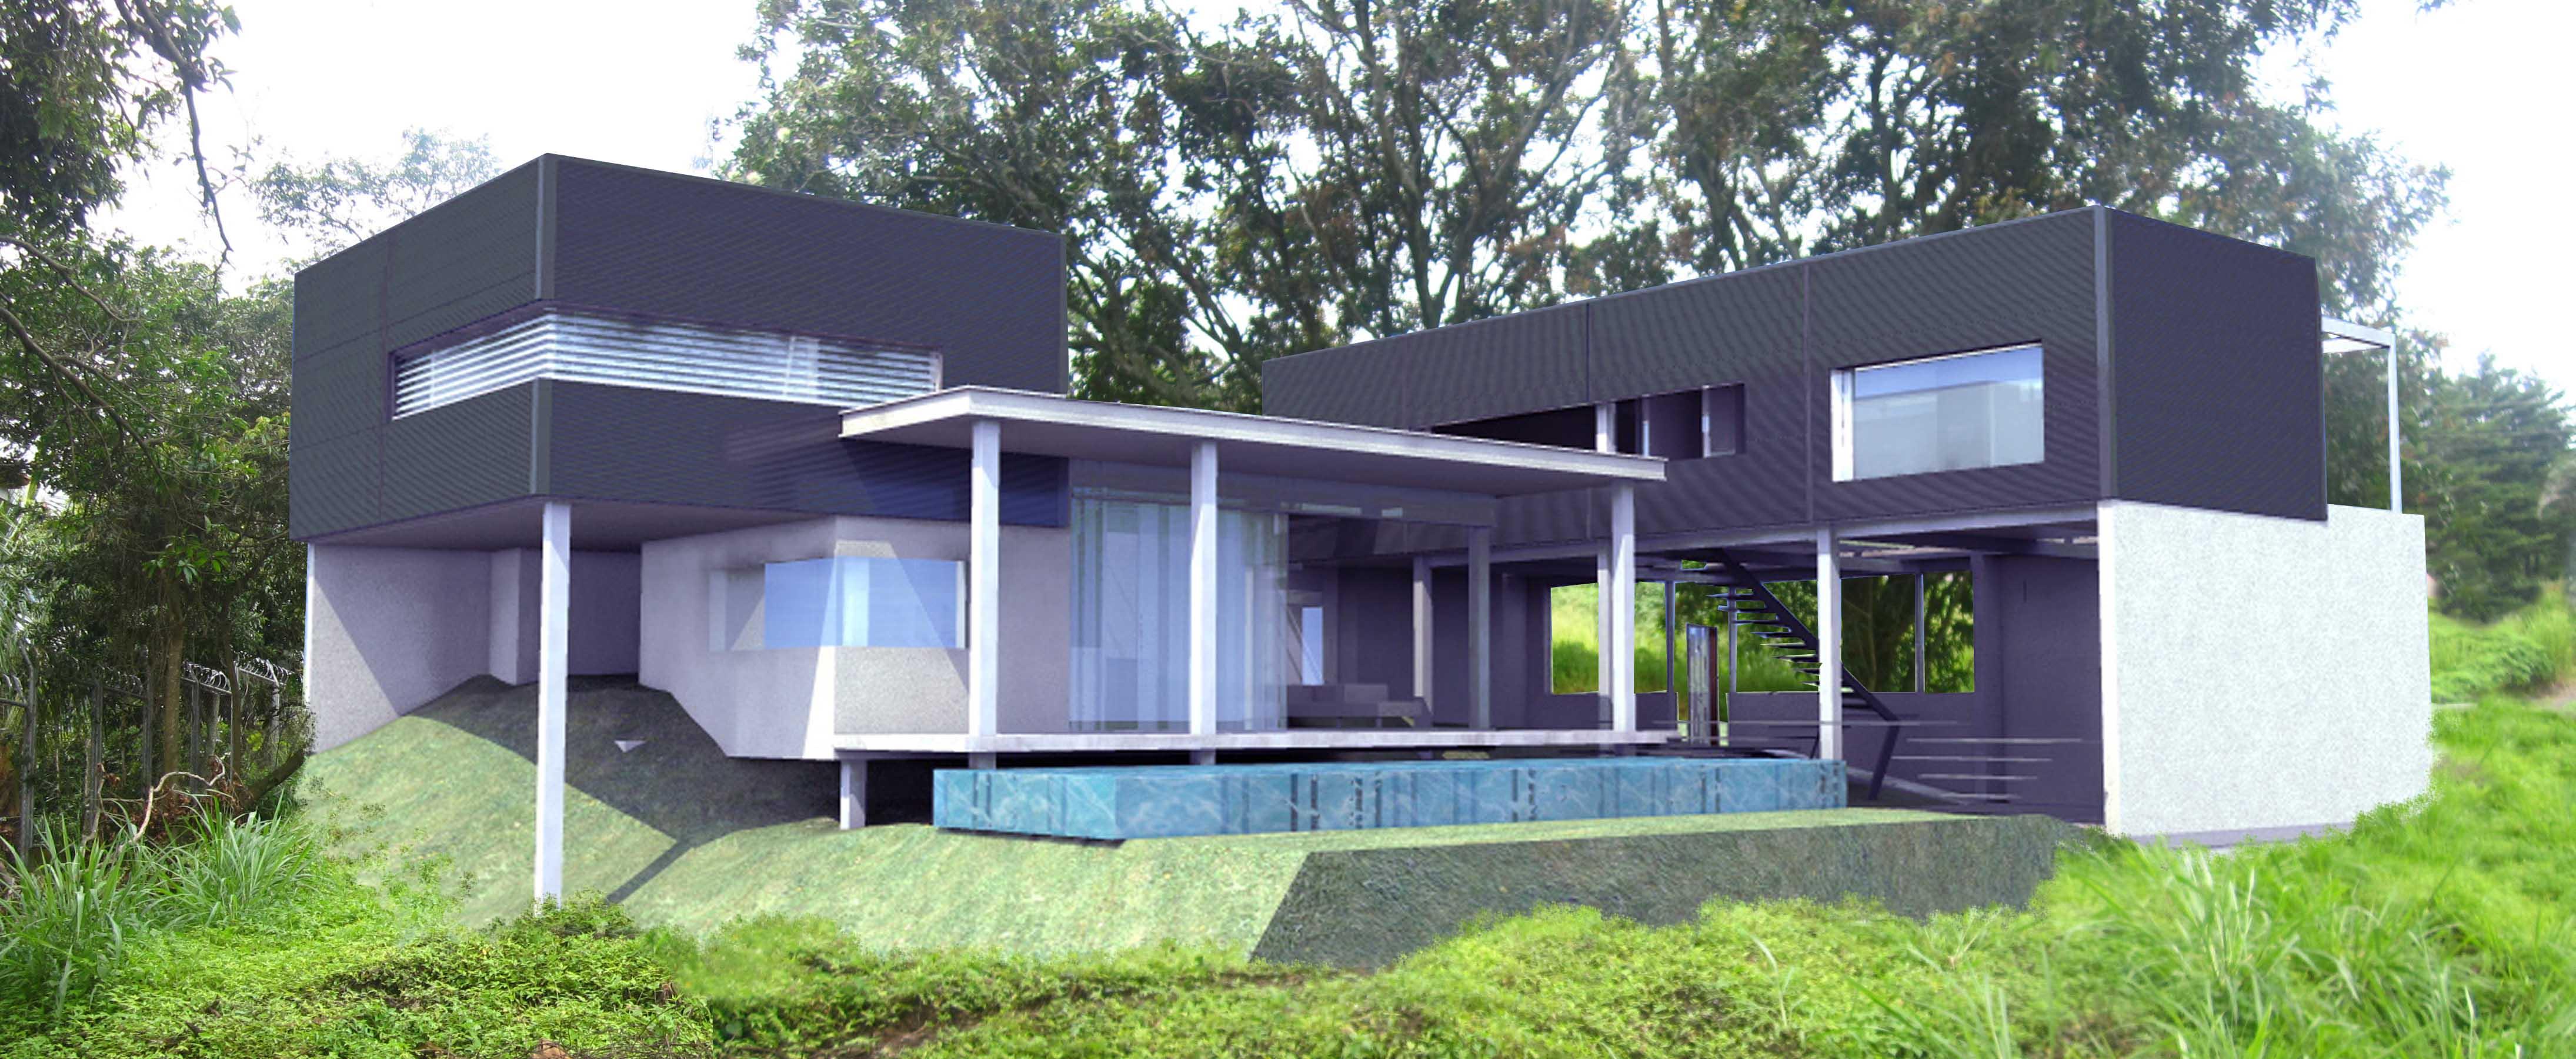 Prefab homes costa rica dott architecture tropical for Prefab tropical homes